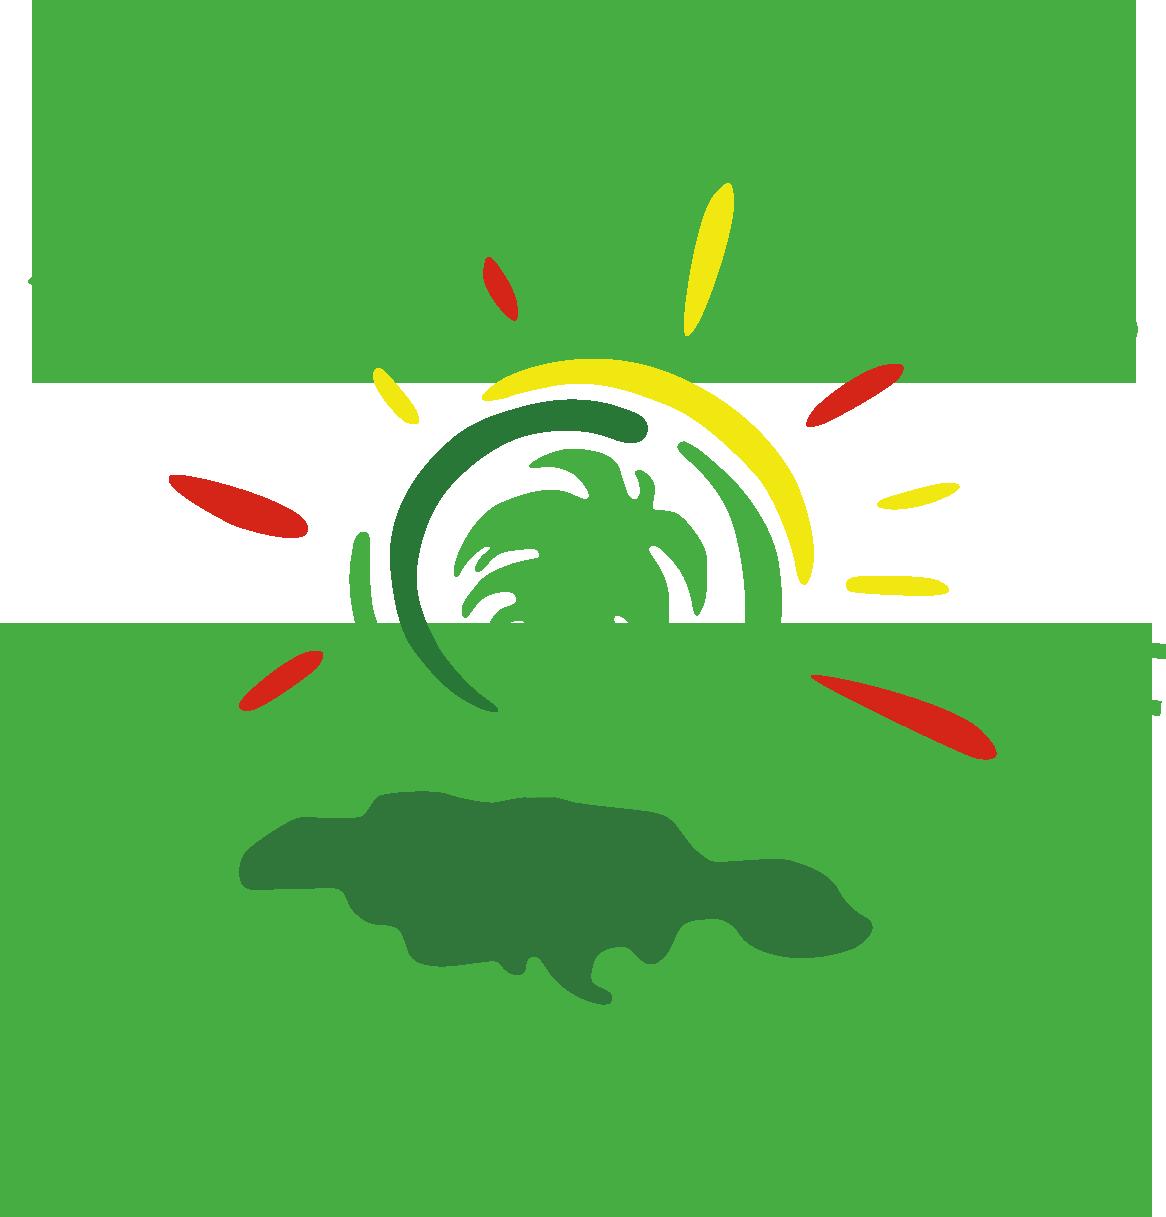 hhjf_logo_green.png